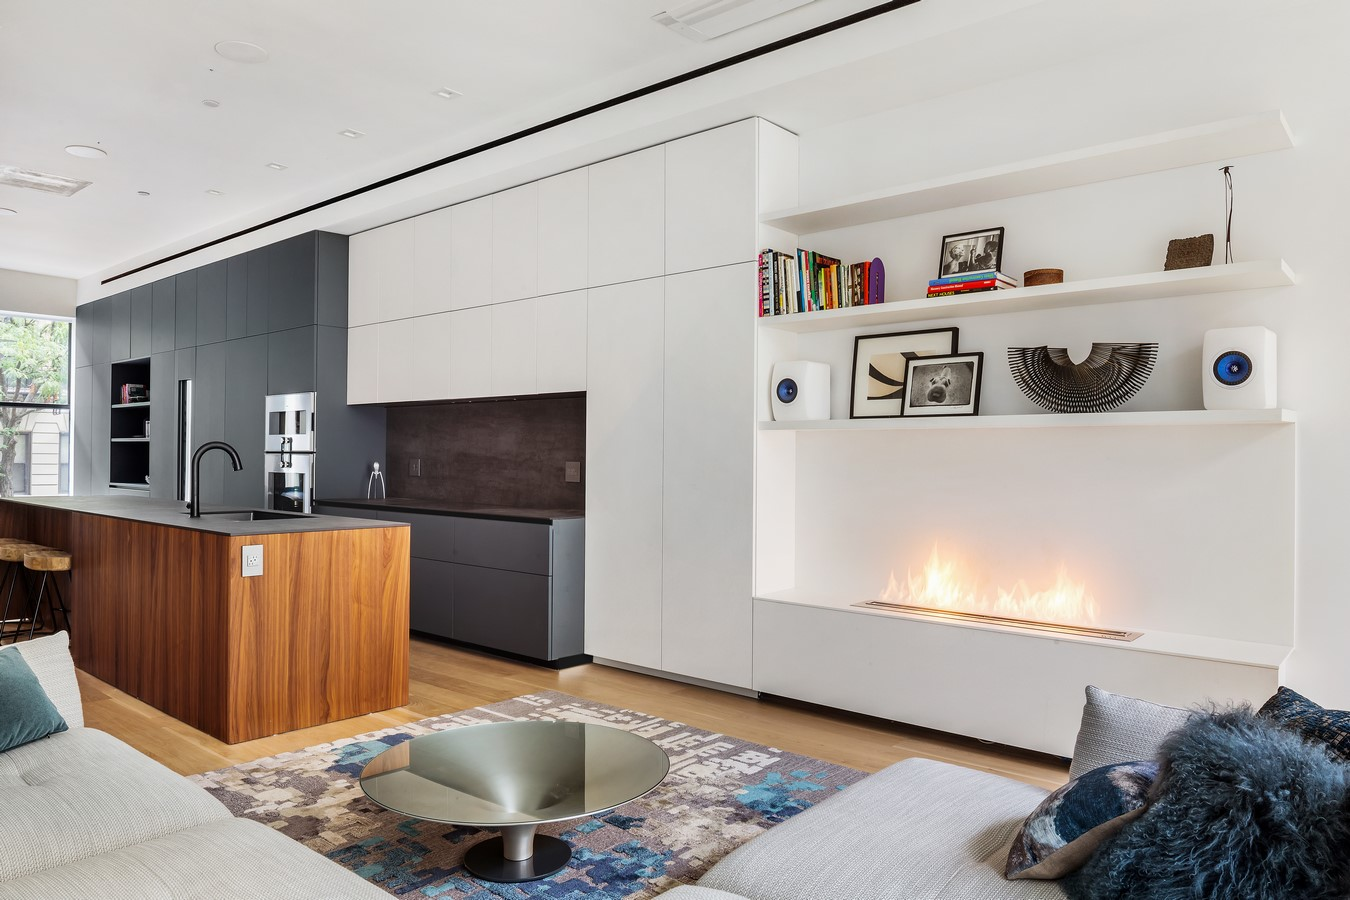 Harlem Brownstone by Kimberly Peck Architect - Sheet1